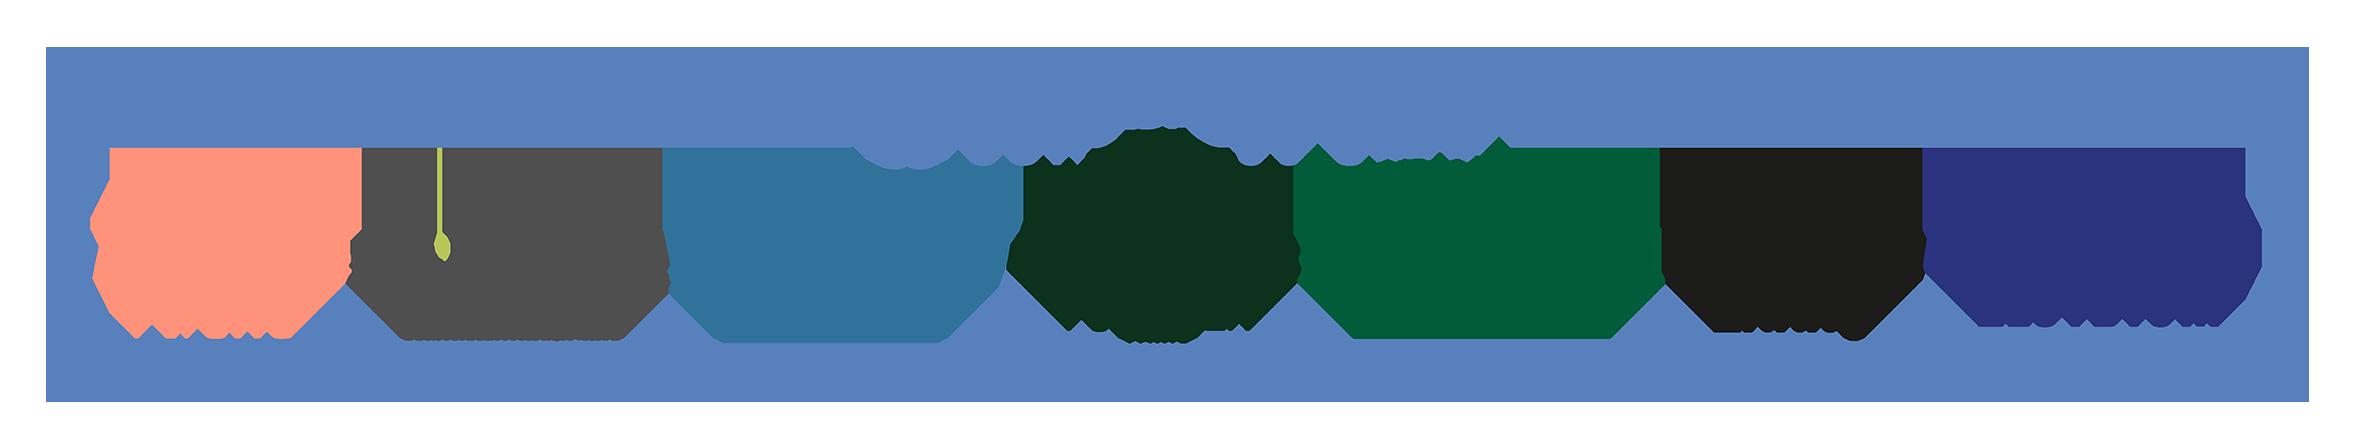 PFDC_CONSCIOUS-CARE_BRAND_DESKTOP